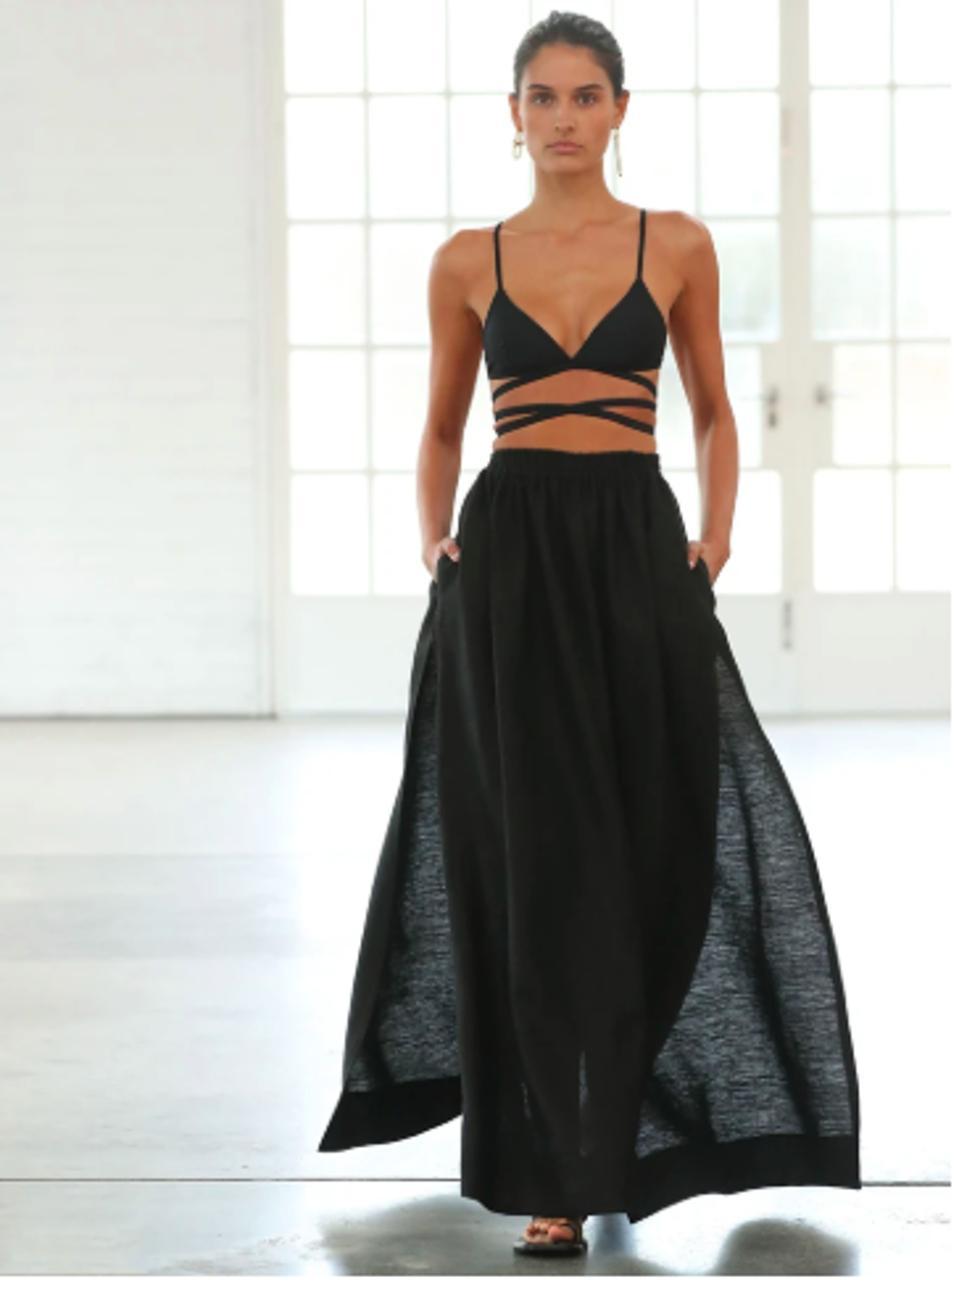 Black triangle wrap bikini top and full skirt by Matteau